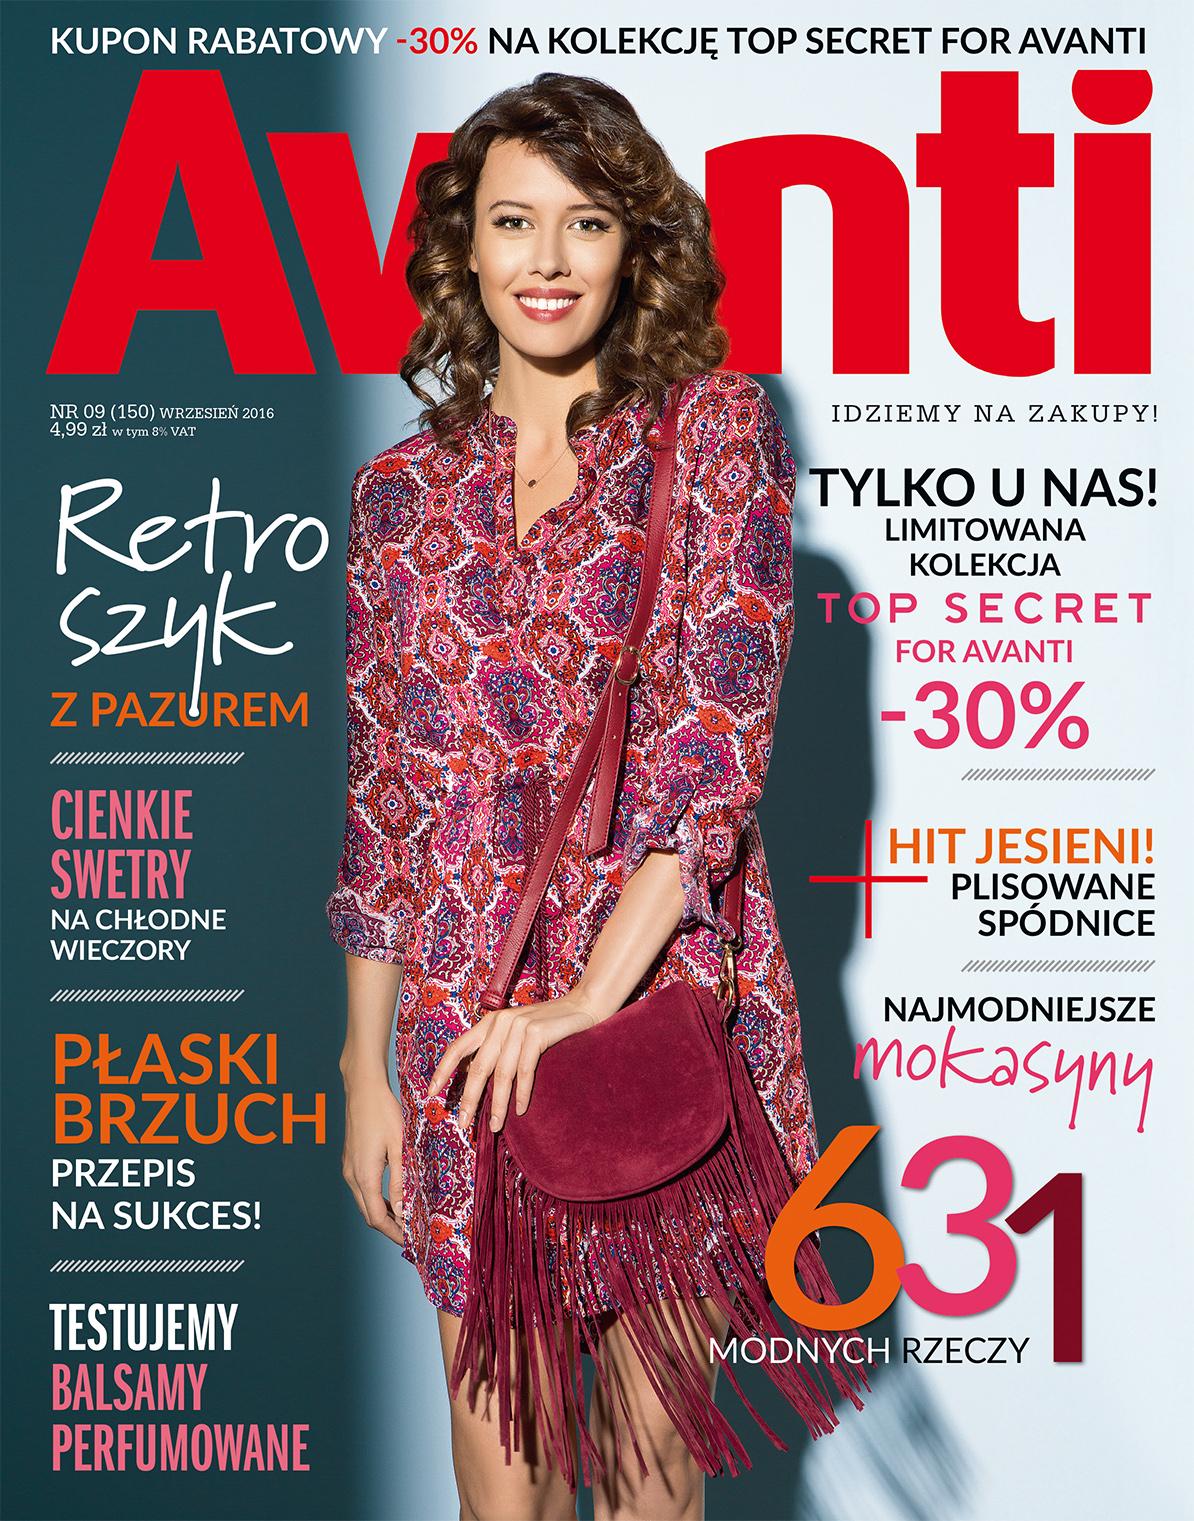 Top Secret: 30% kupon rabatowy z Avanti